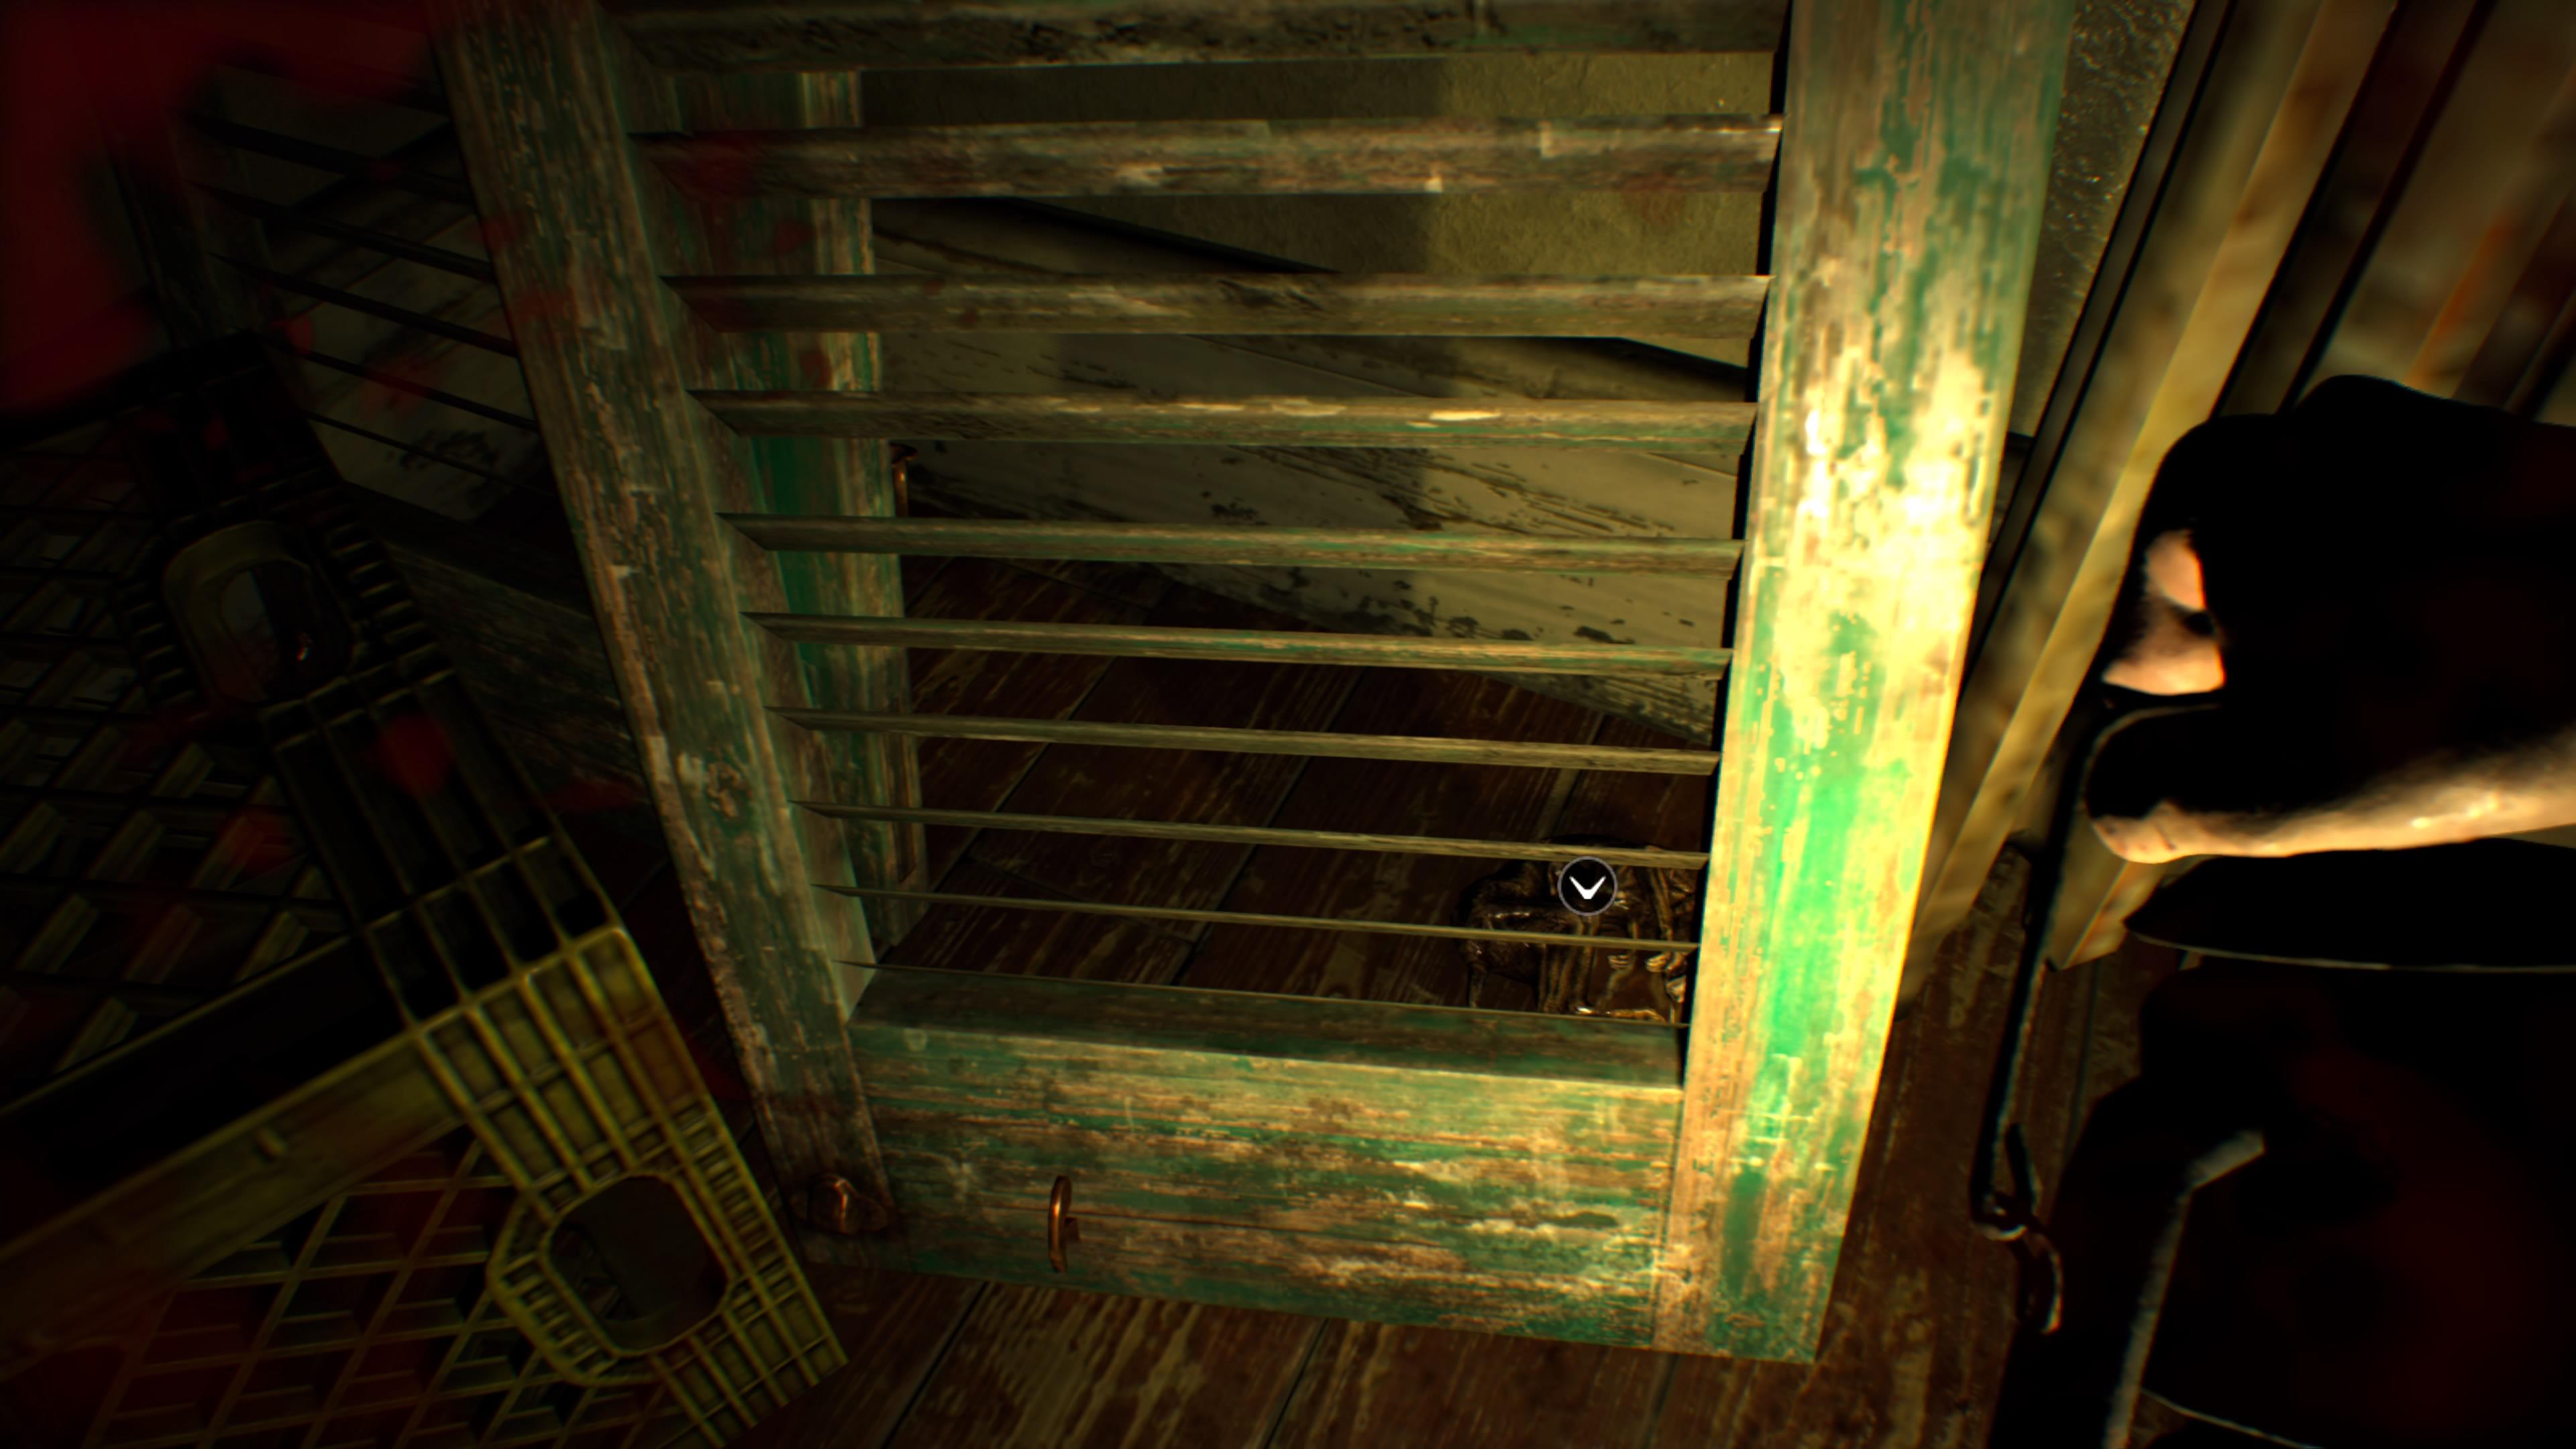 Resident Evil 7 Bedroom Dlc Acquiring The 39 Ratcatcher 39 Trophy Achievement Just Push Start